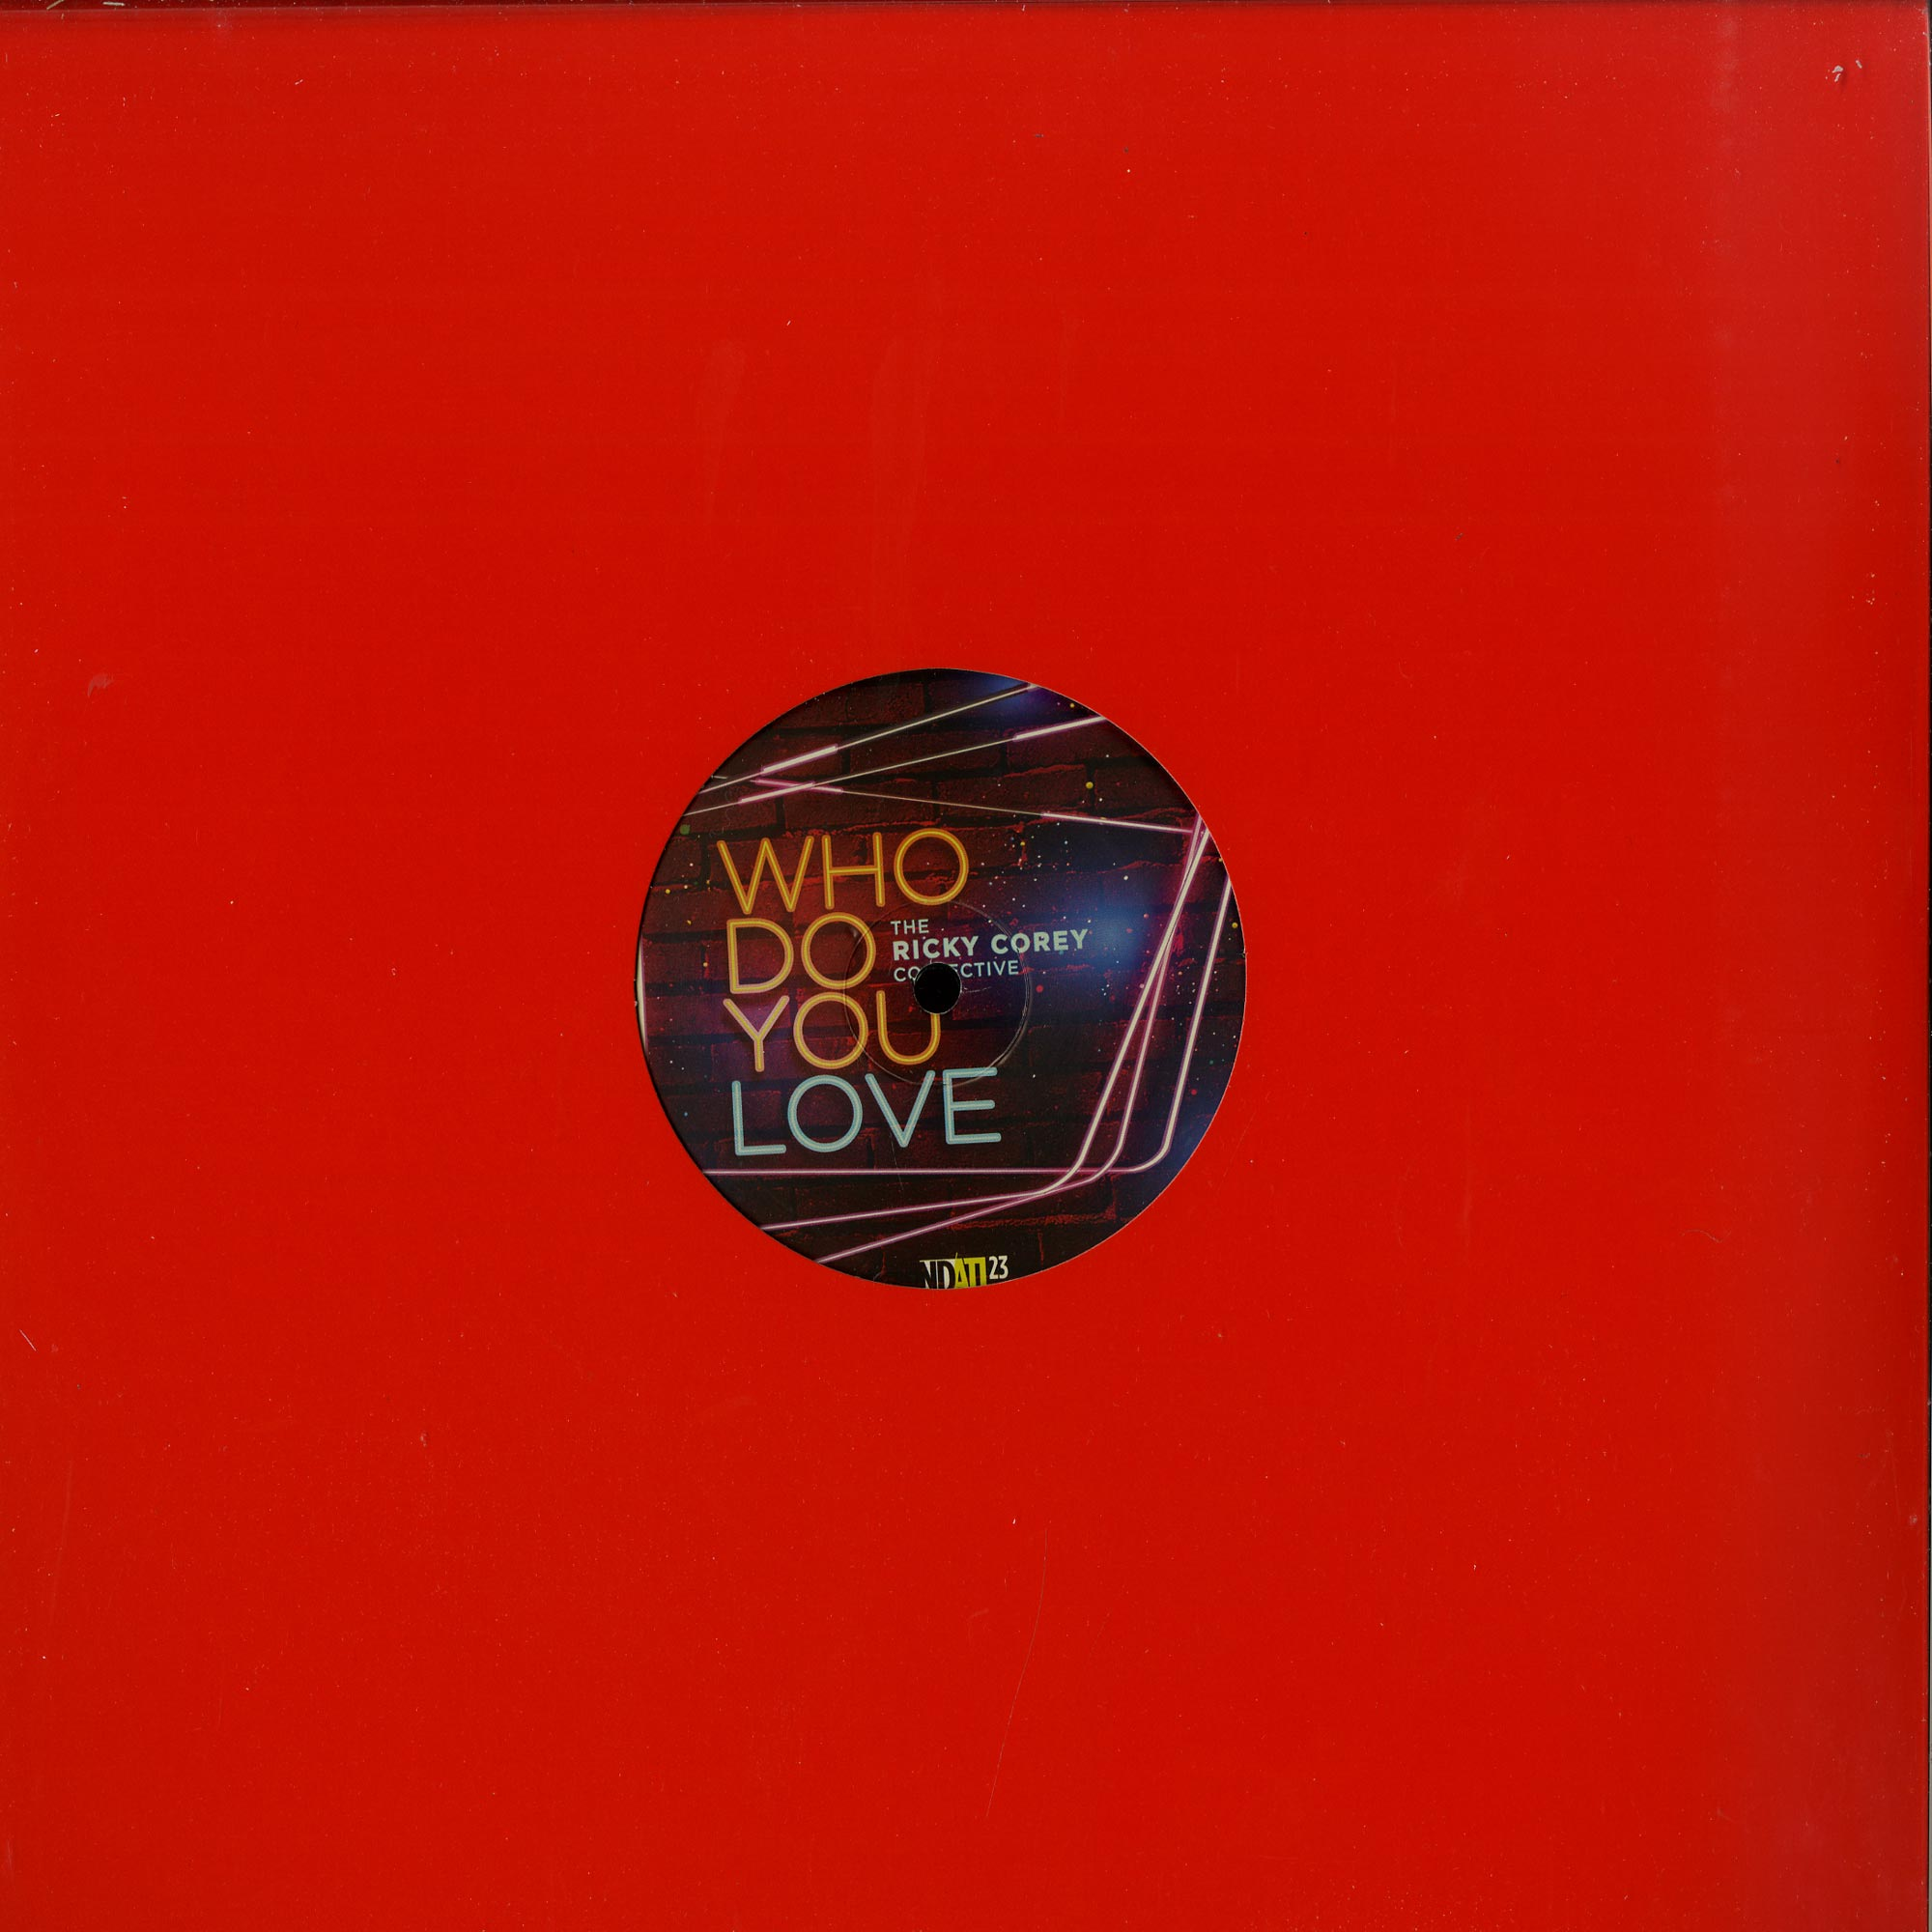 The Rickey Corey Collective - WHO DO YOU LOVE?